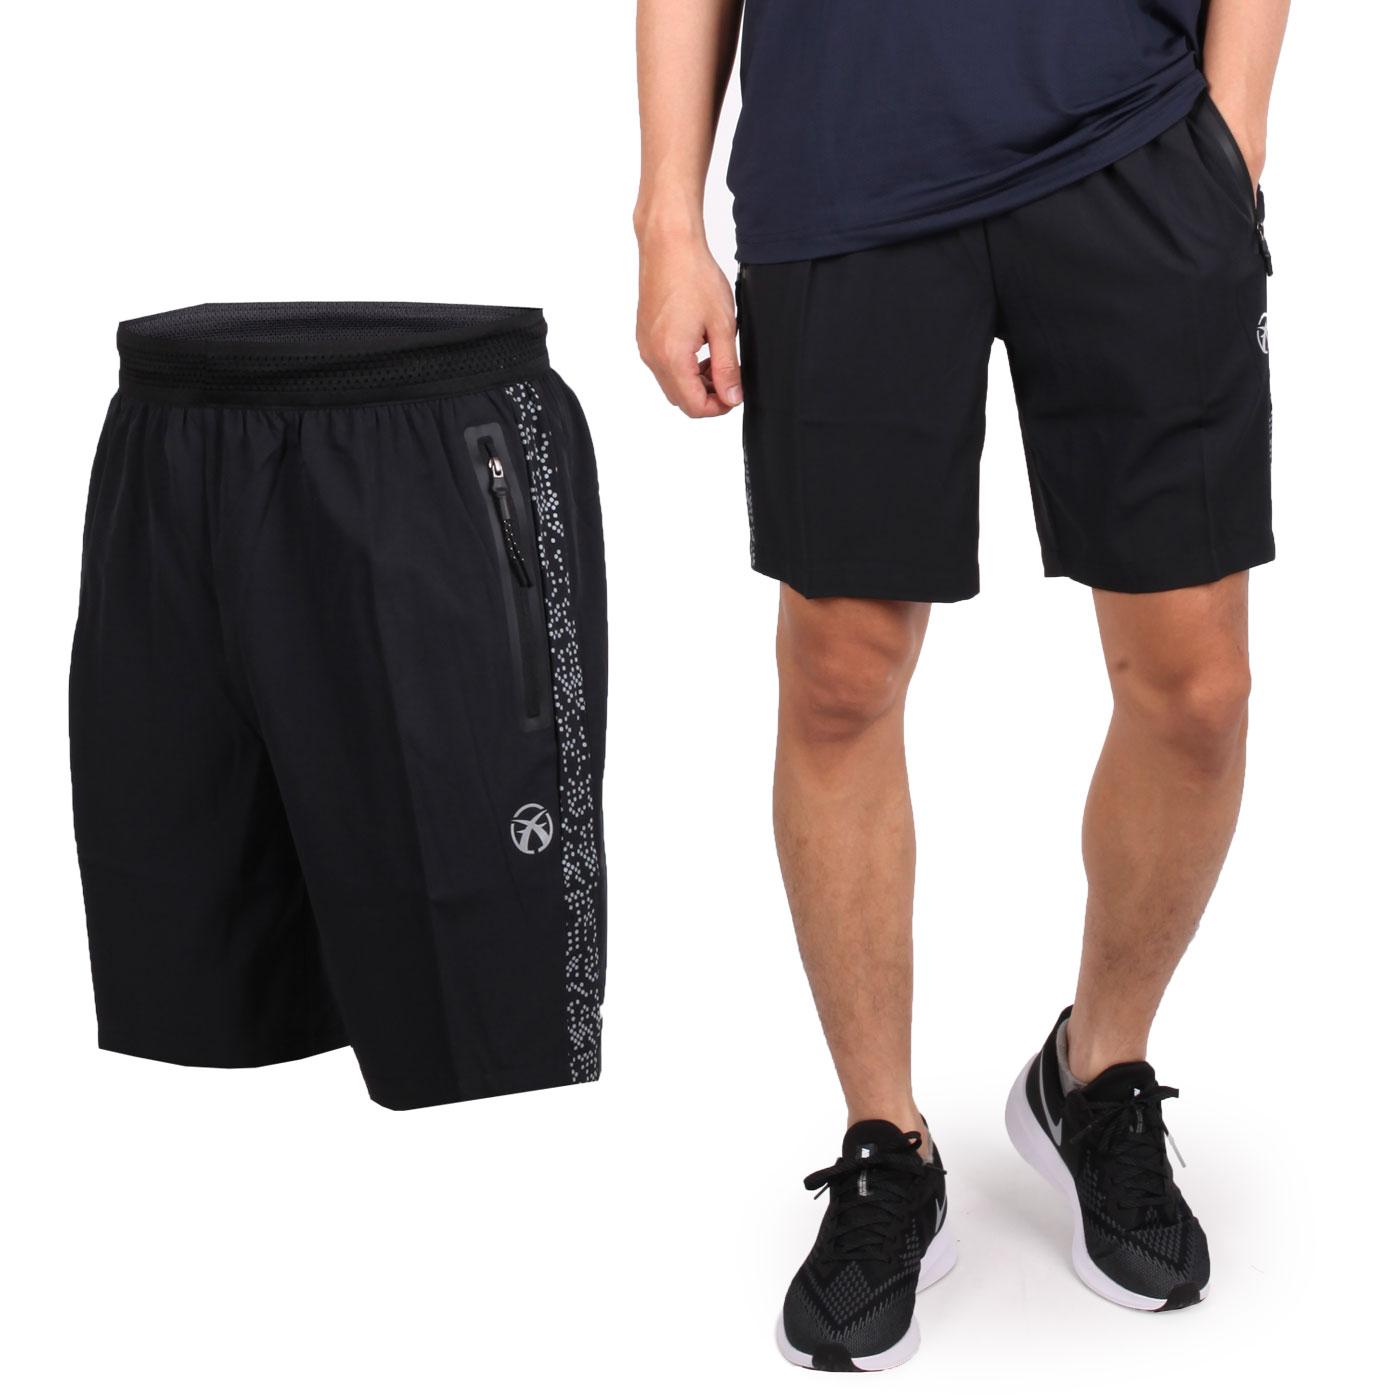 FIRESTAR 男款彈性平織短褲 C9218-10 - 黑銀